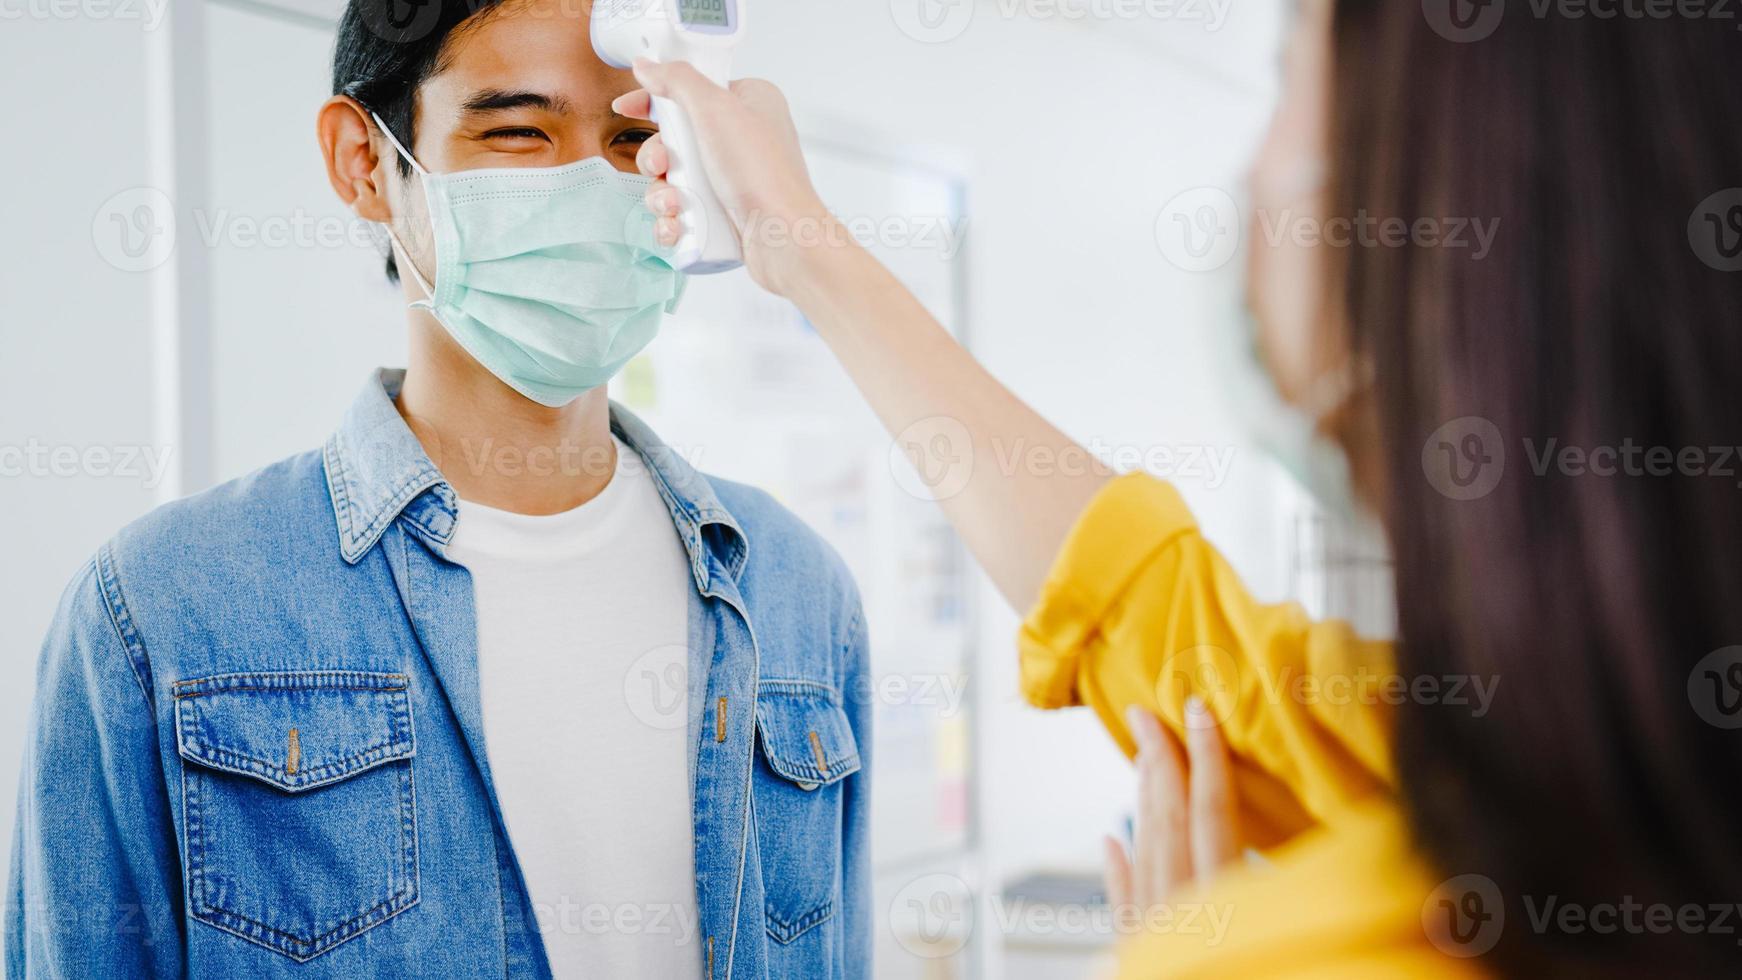 ásia recepcionista conduzindo usar máscara protetora de rosto use verificador de termômetro infravermelho ou pistola de temperatura na testa do cliente antes de entrar no escritório. estilo de vida novo normal após o vírus corona. foto